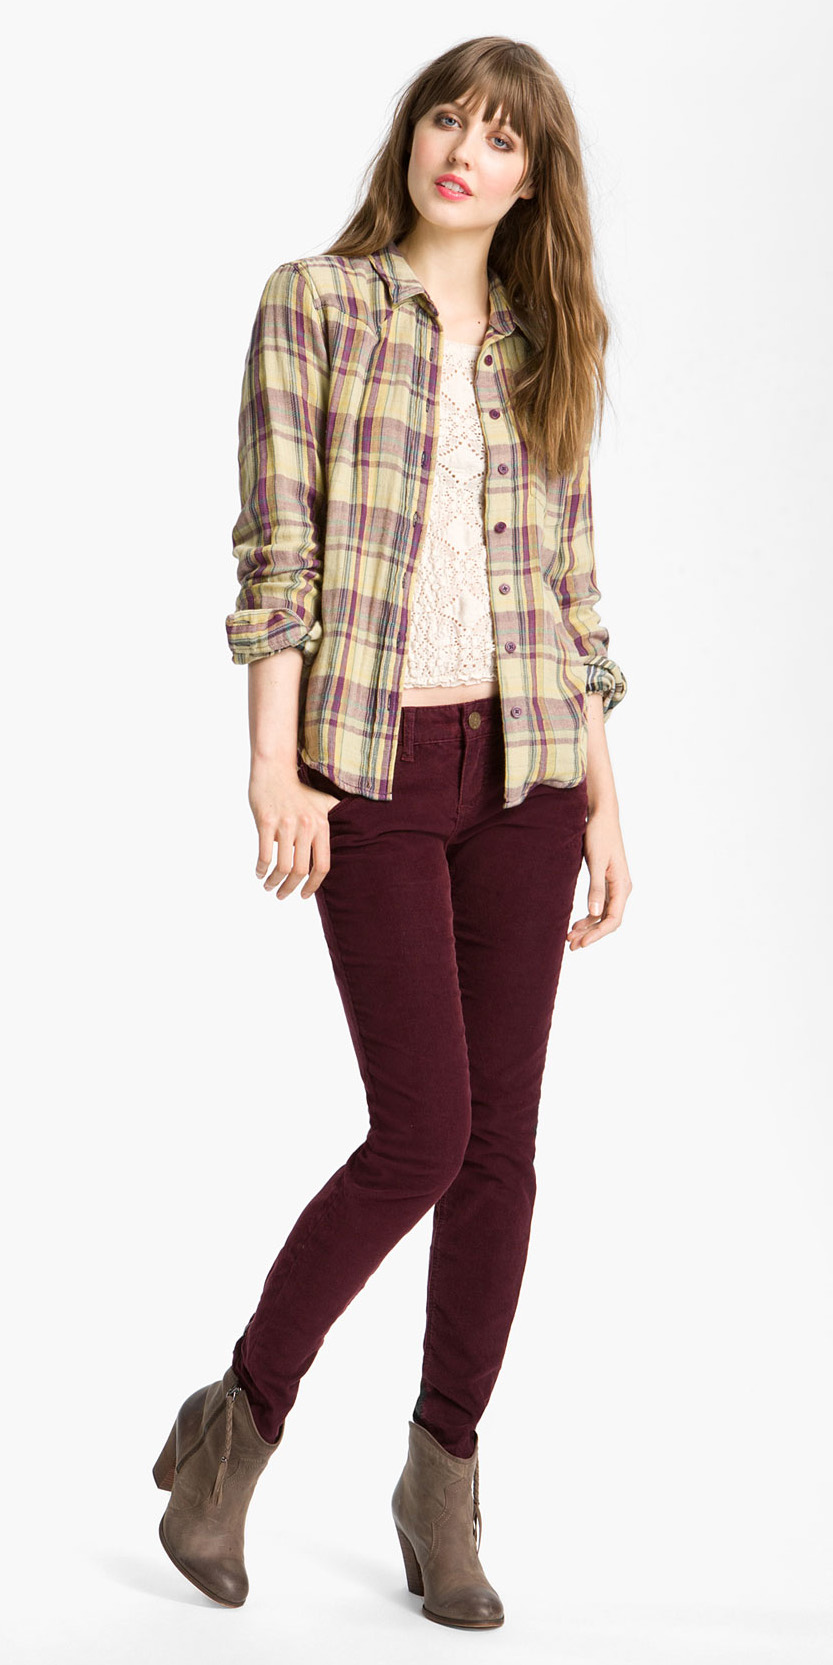 burgundy-skinny-jeans-tan-shoe-booties-yellow-plaid-shirt-fall-winter-hairr-weekend.jpeg